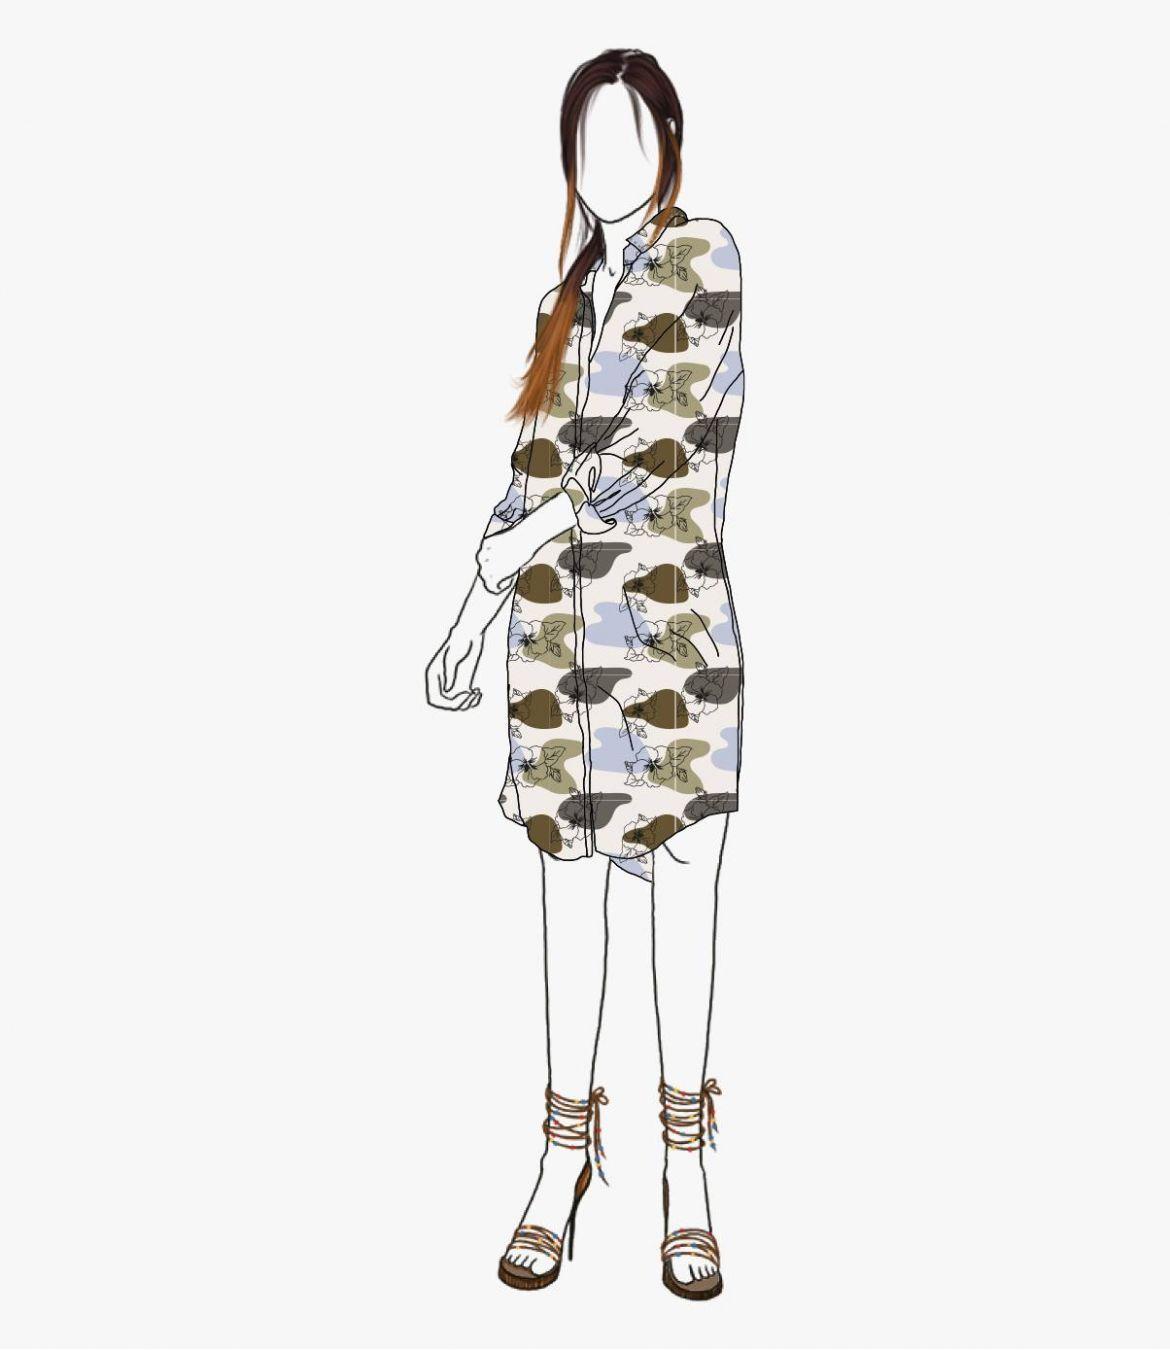 KAIA VANYA Women's Modal Dress Storiatipic - 3